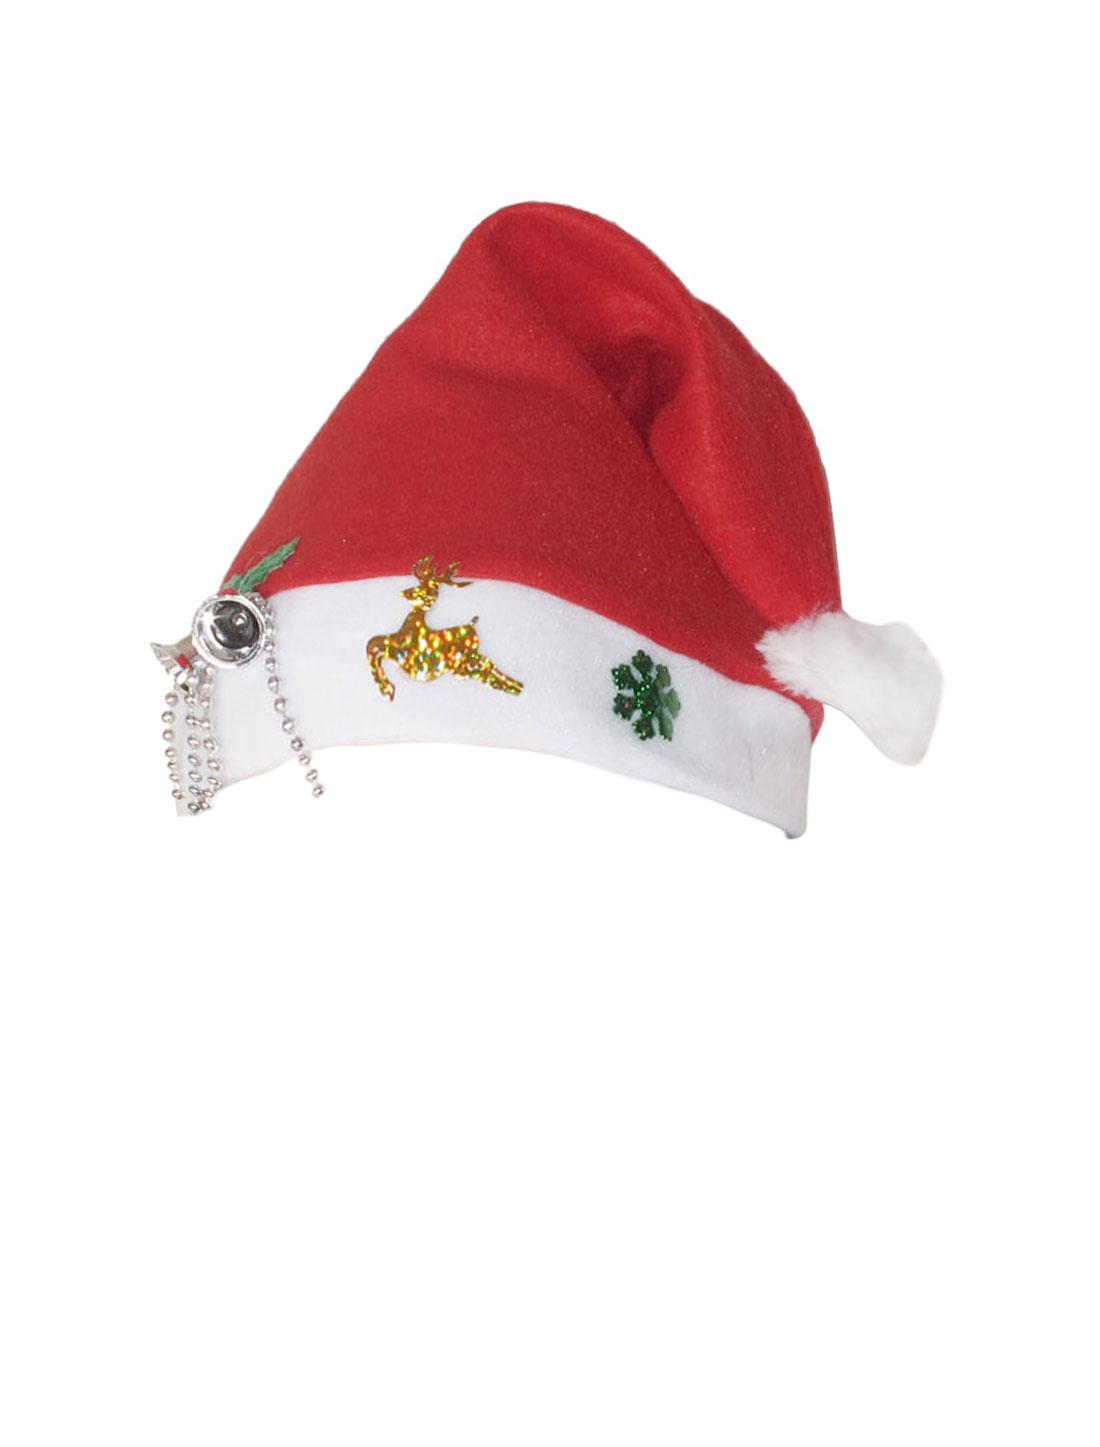 5 Pcs Jingle Bell Deer Detail White Rim True Red Christmas Santa Hat for Adult